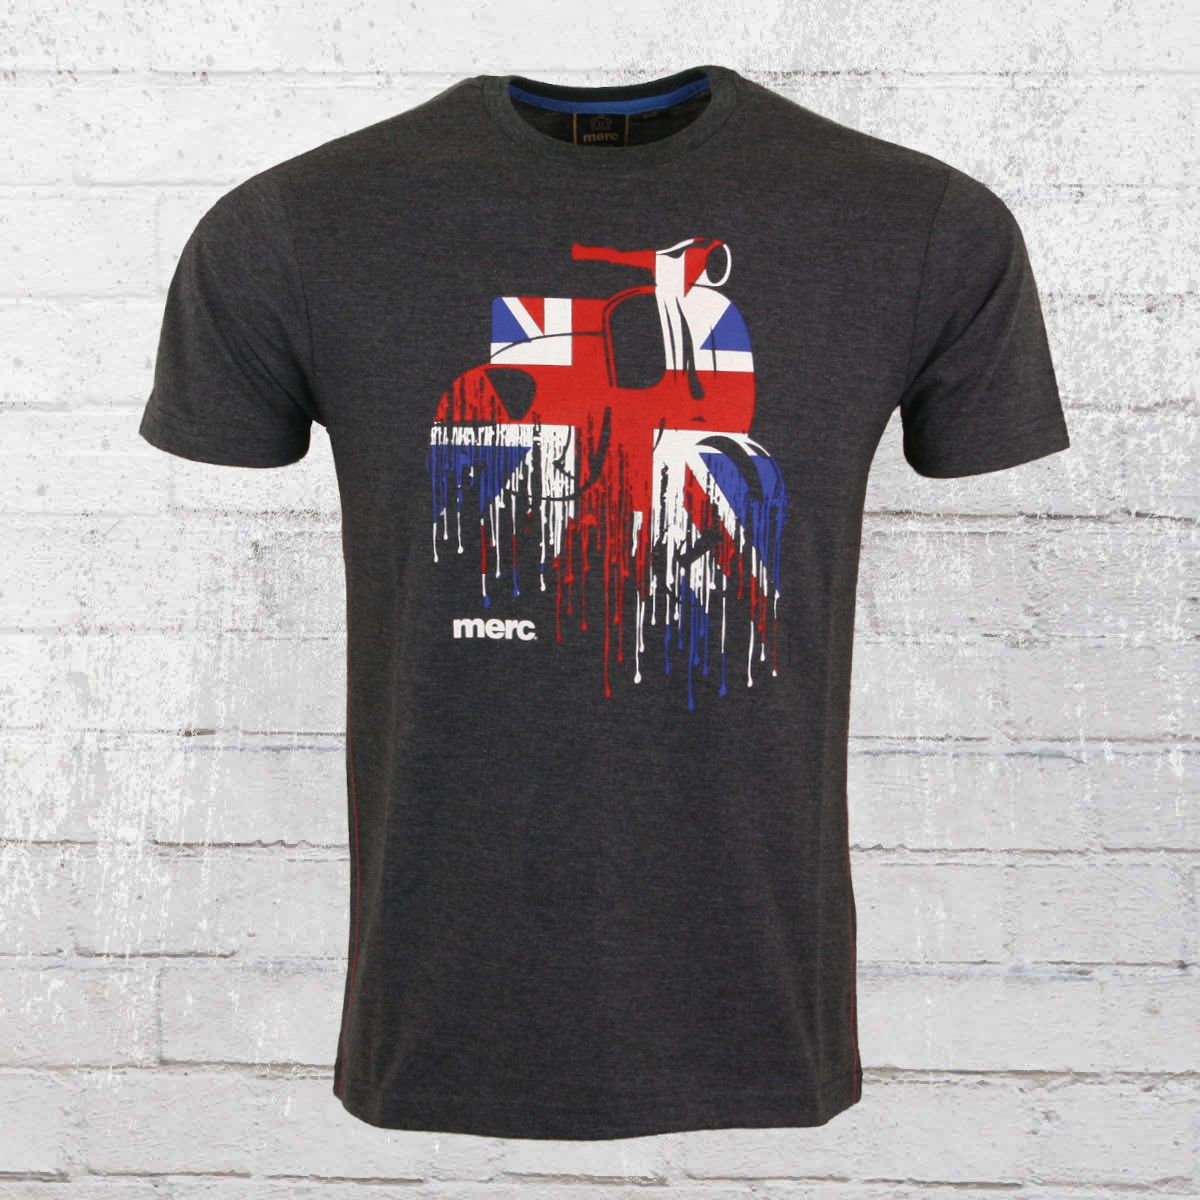 jetzt bestellen merc london t shirt herren oliver. Black Bedroom Furniture Sets. Home Design Ideas